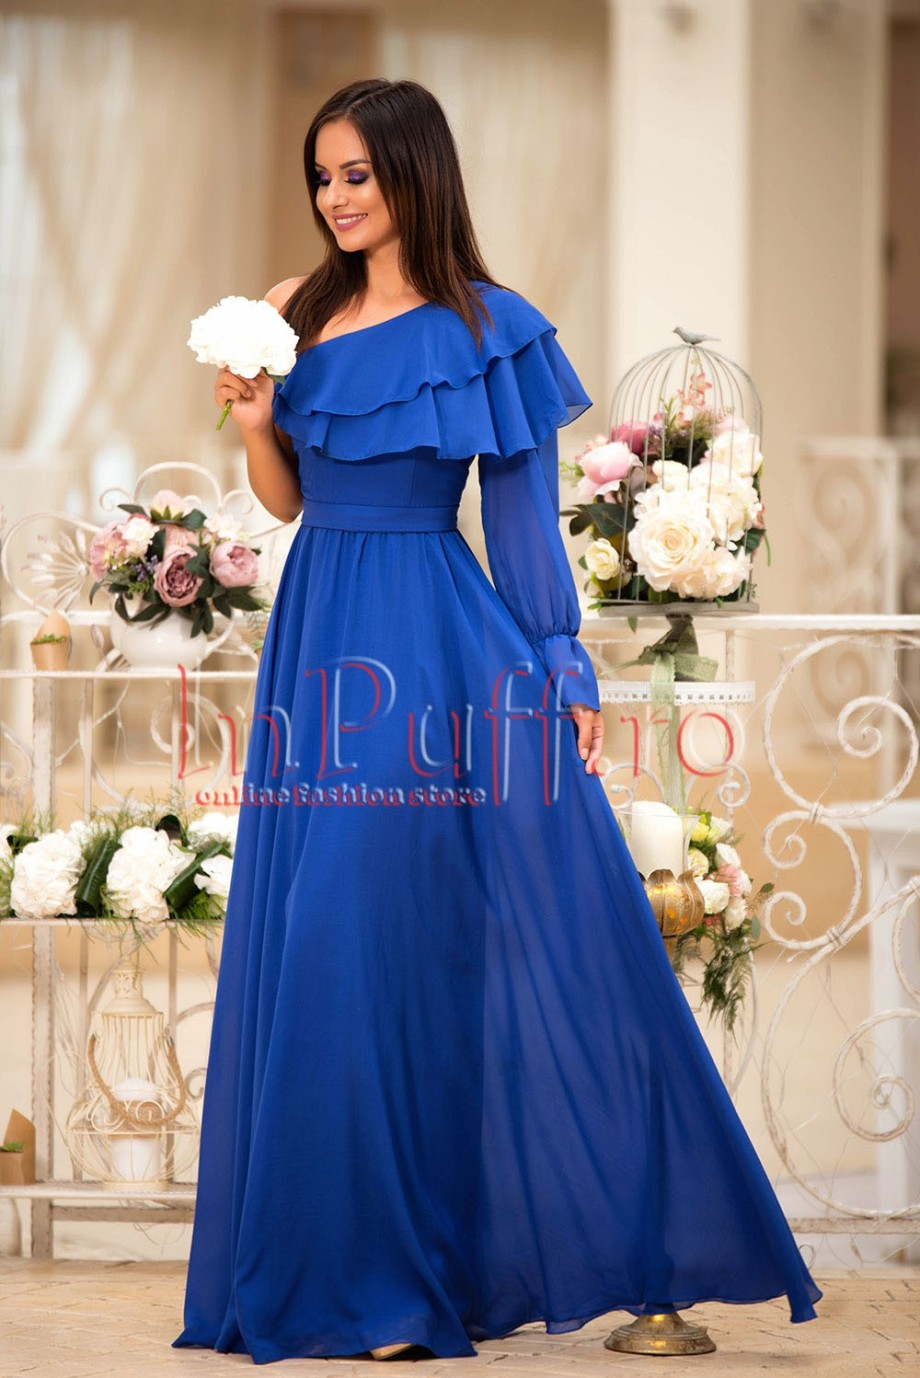 rochie-de-seara-lunga-albastra-din-voal-1503412783-4